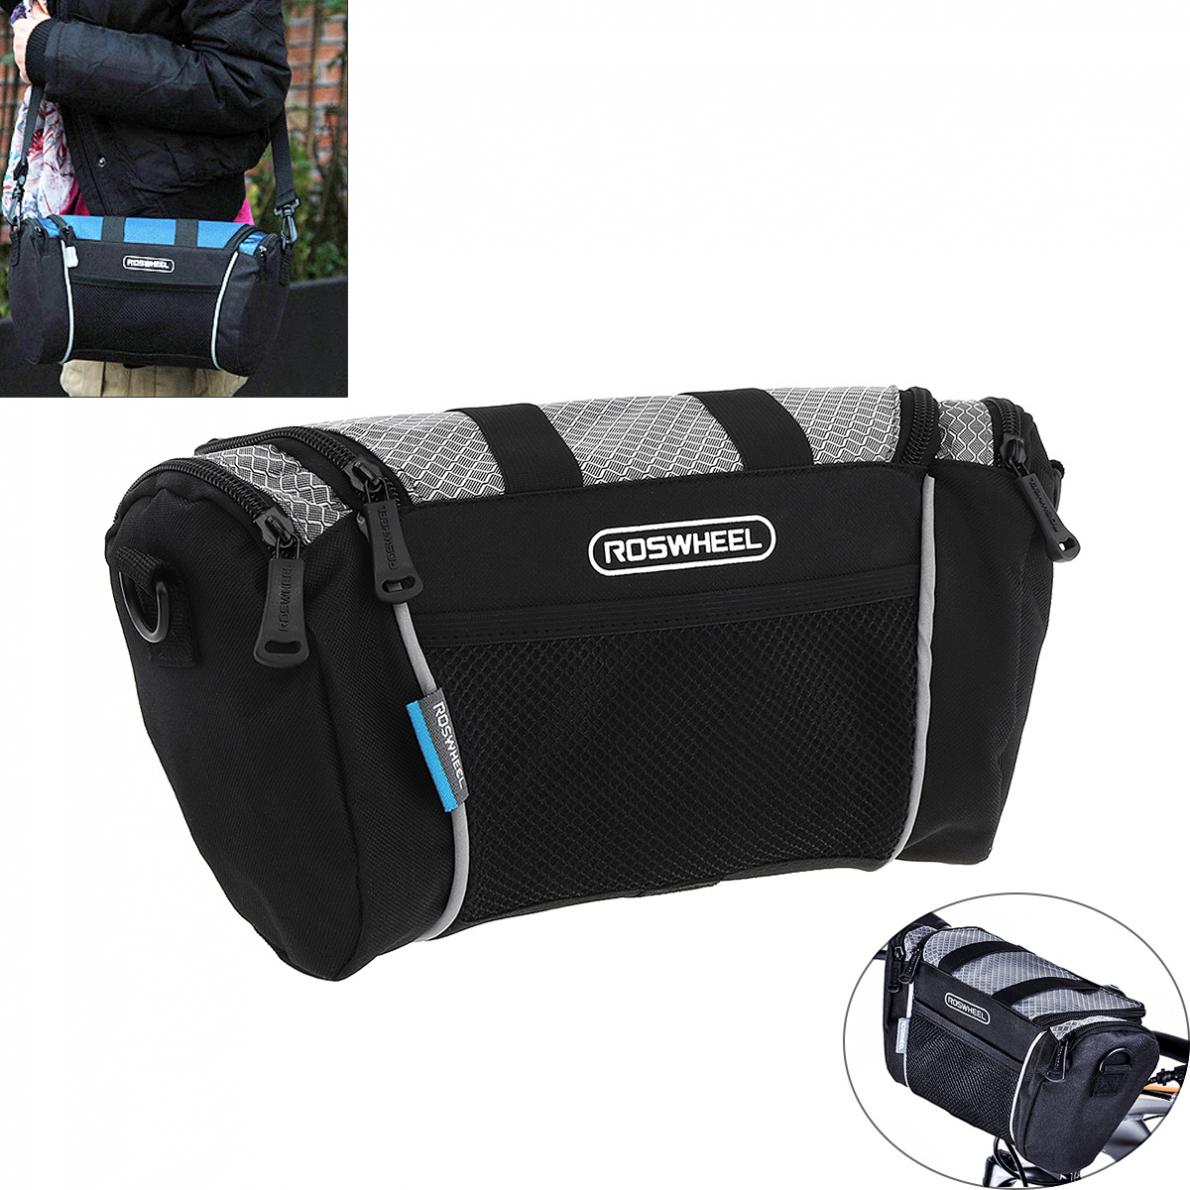 78575533f92 Roswheel 5L bolso de bicicleta de ciclismo bolso de manillar de bicicleta  de tubo delantero de